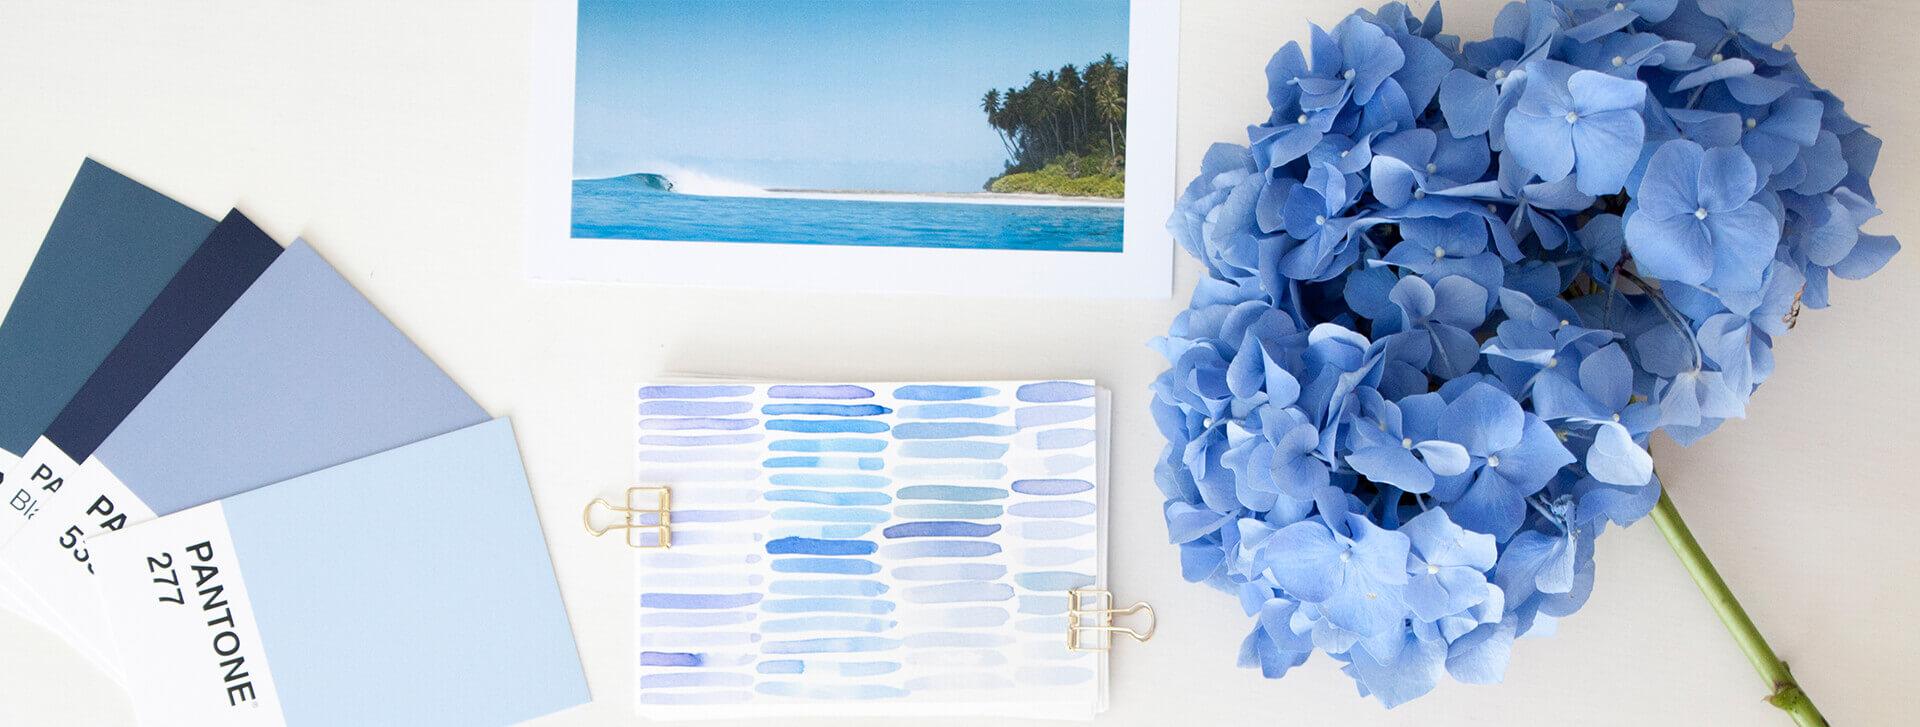 Blau als Brandingfarbe